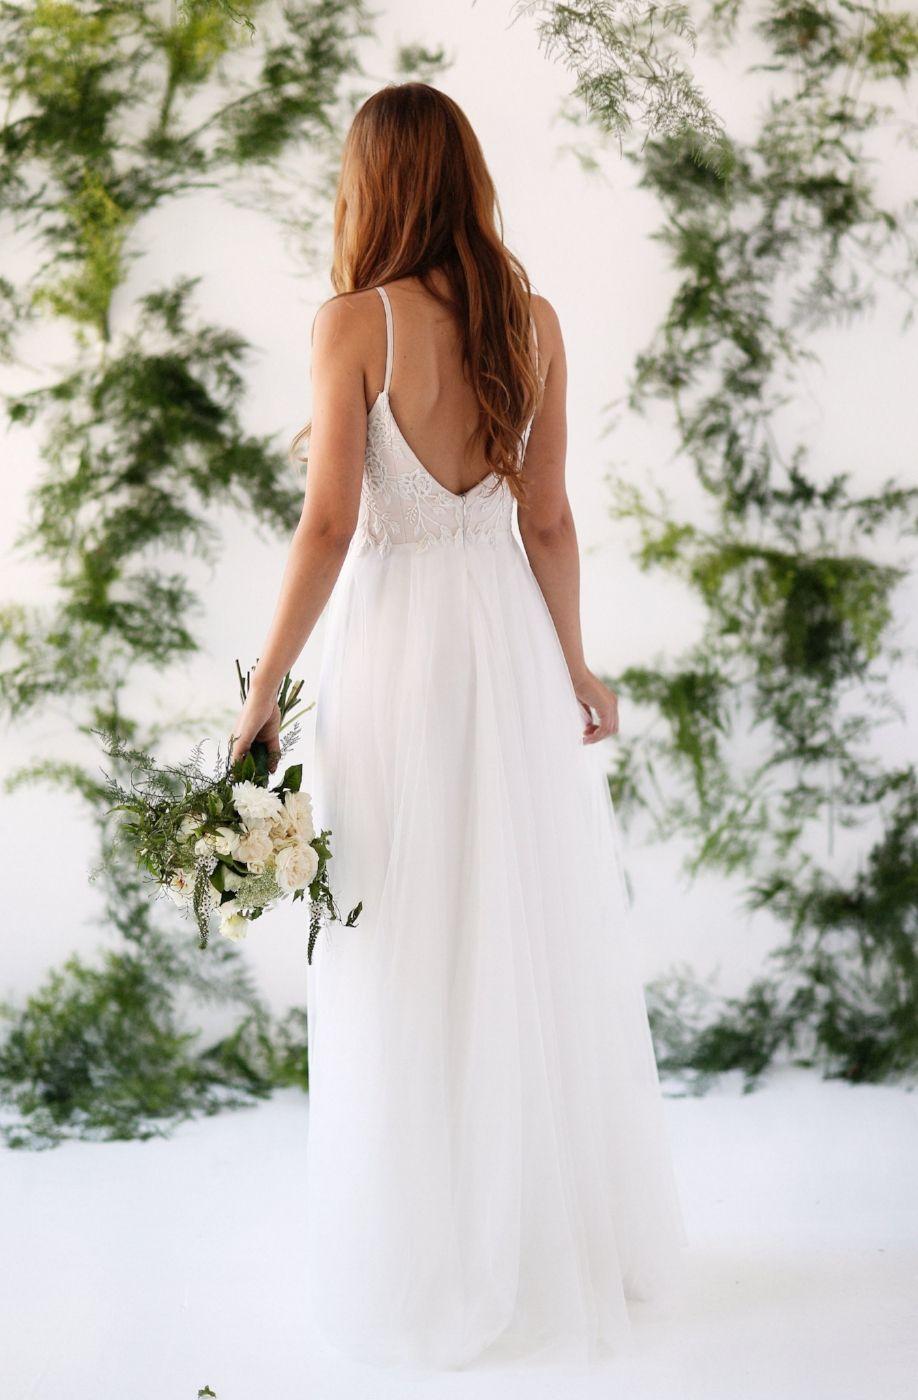 Marina semone wedding dress victoria dress boho bride romantic